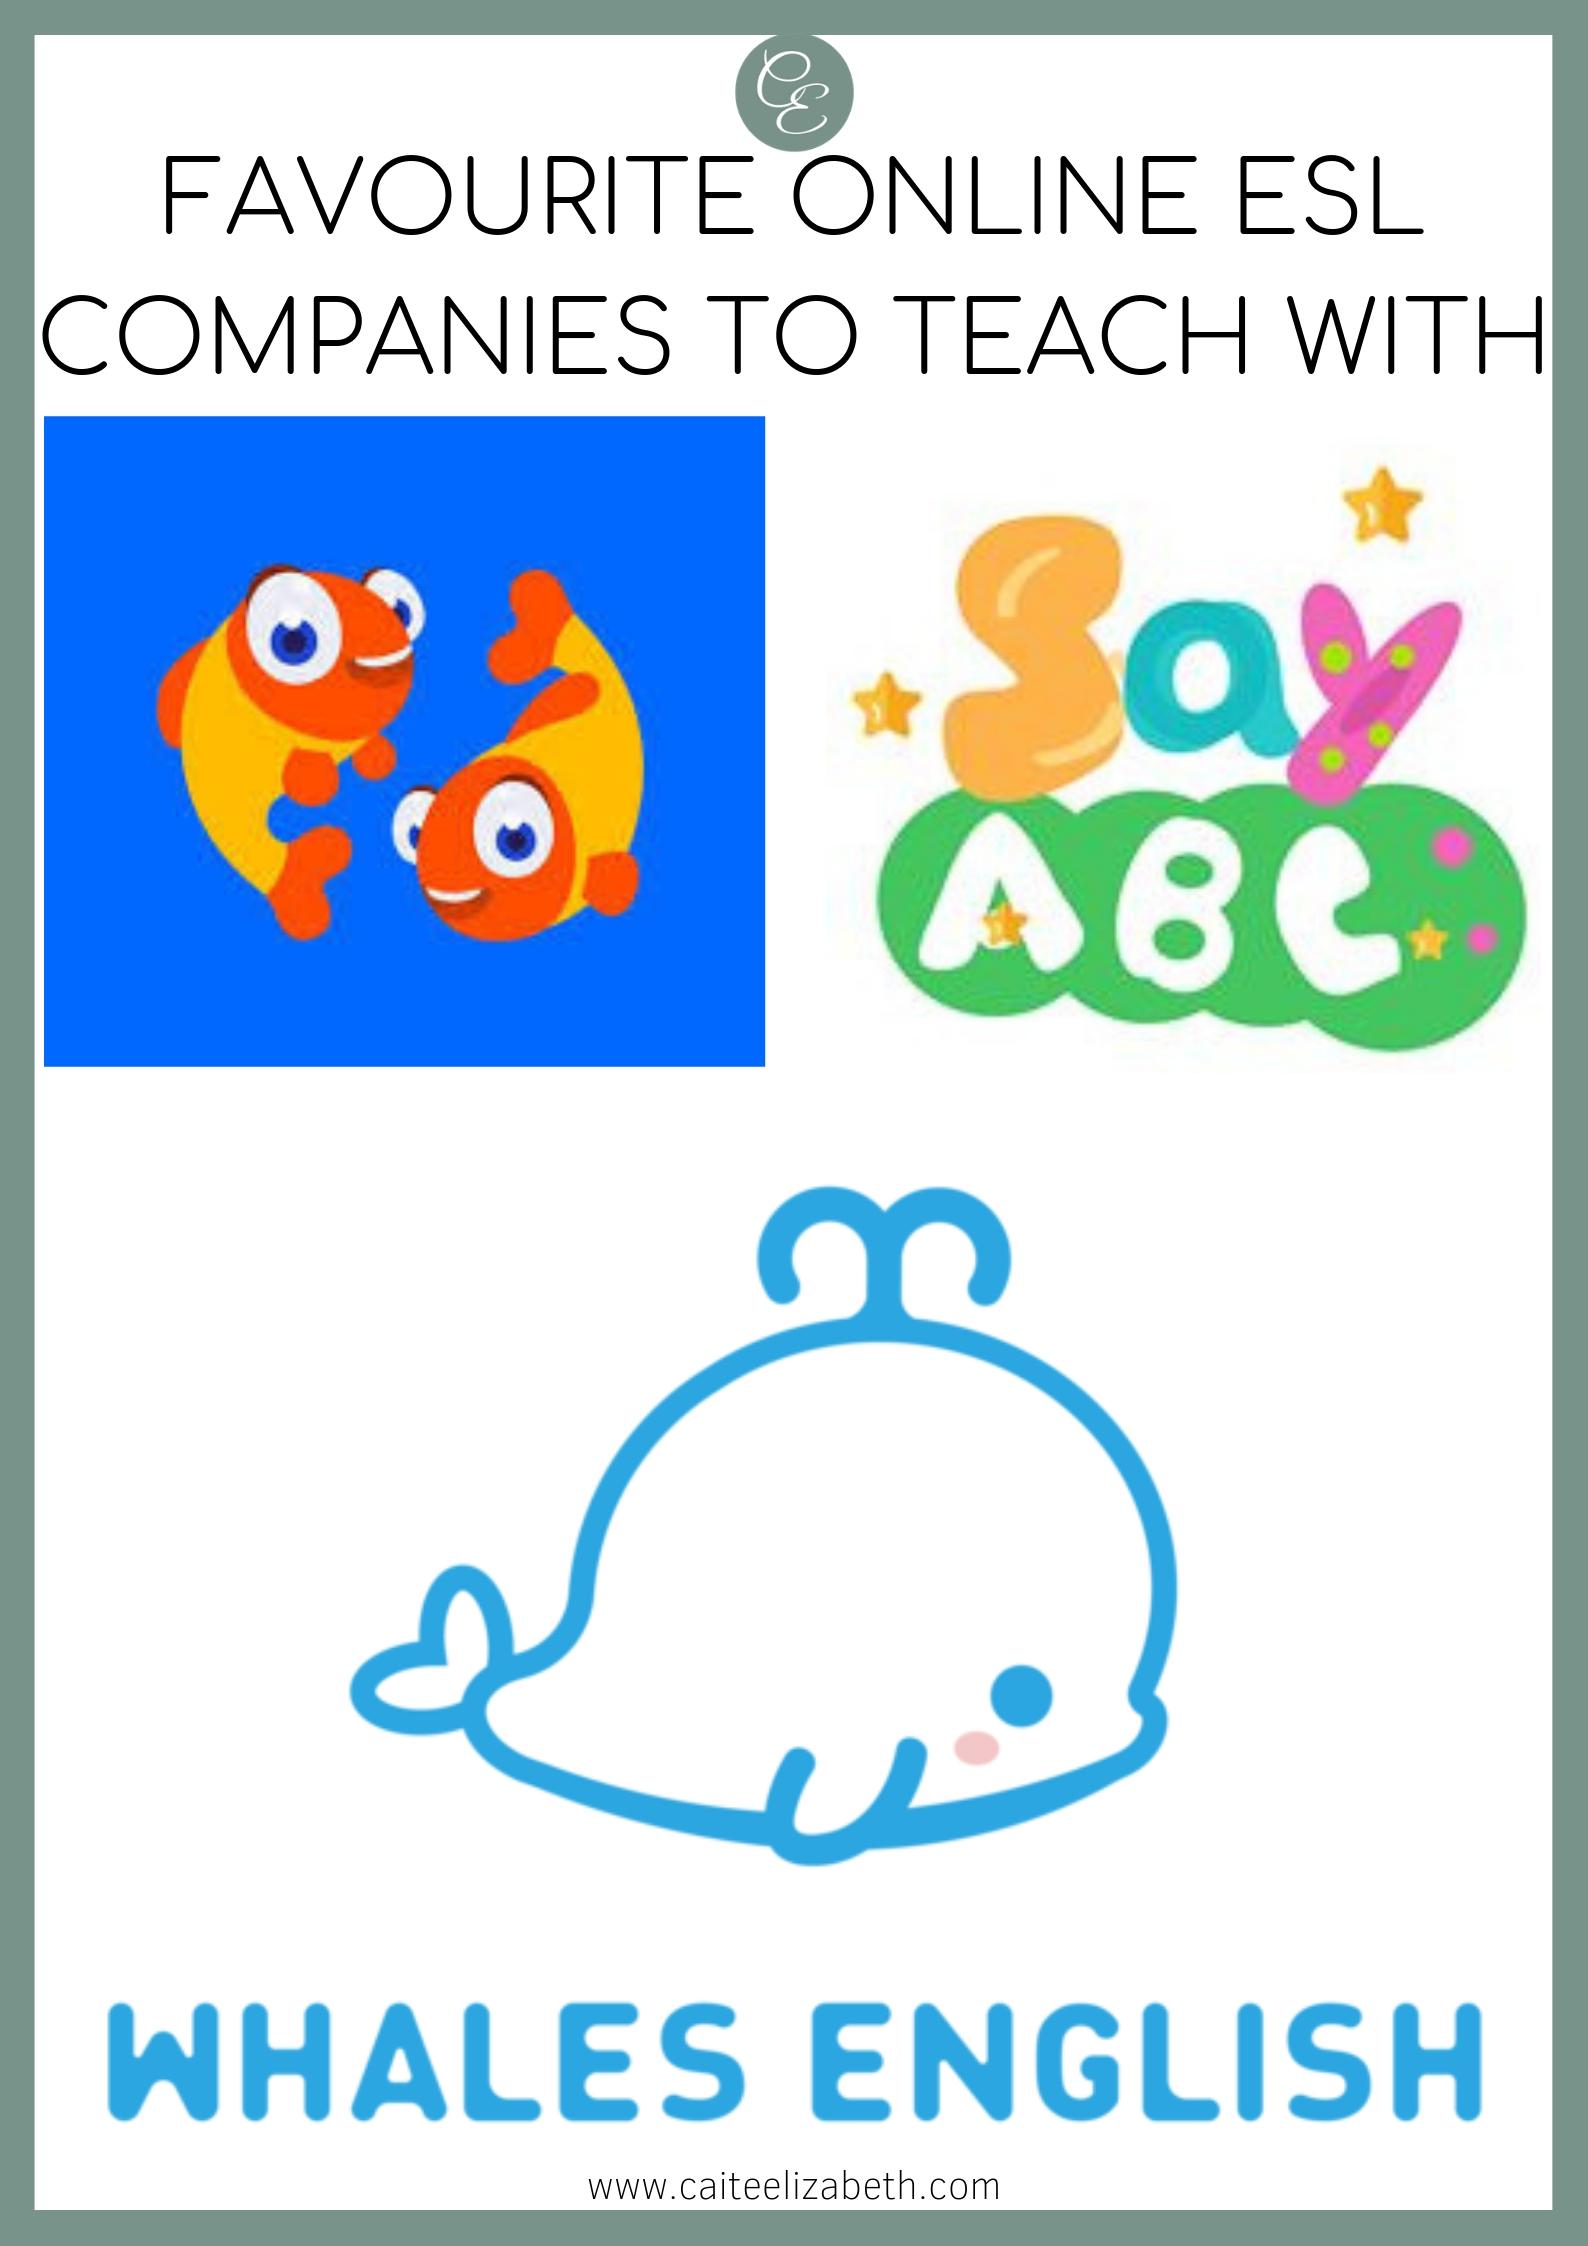 Logos for PalFish, SayABC and Whales English